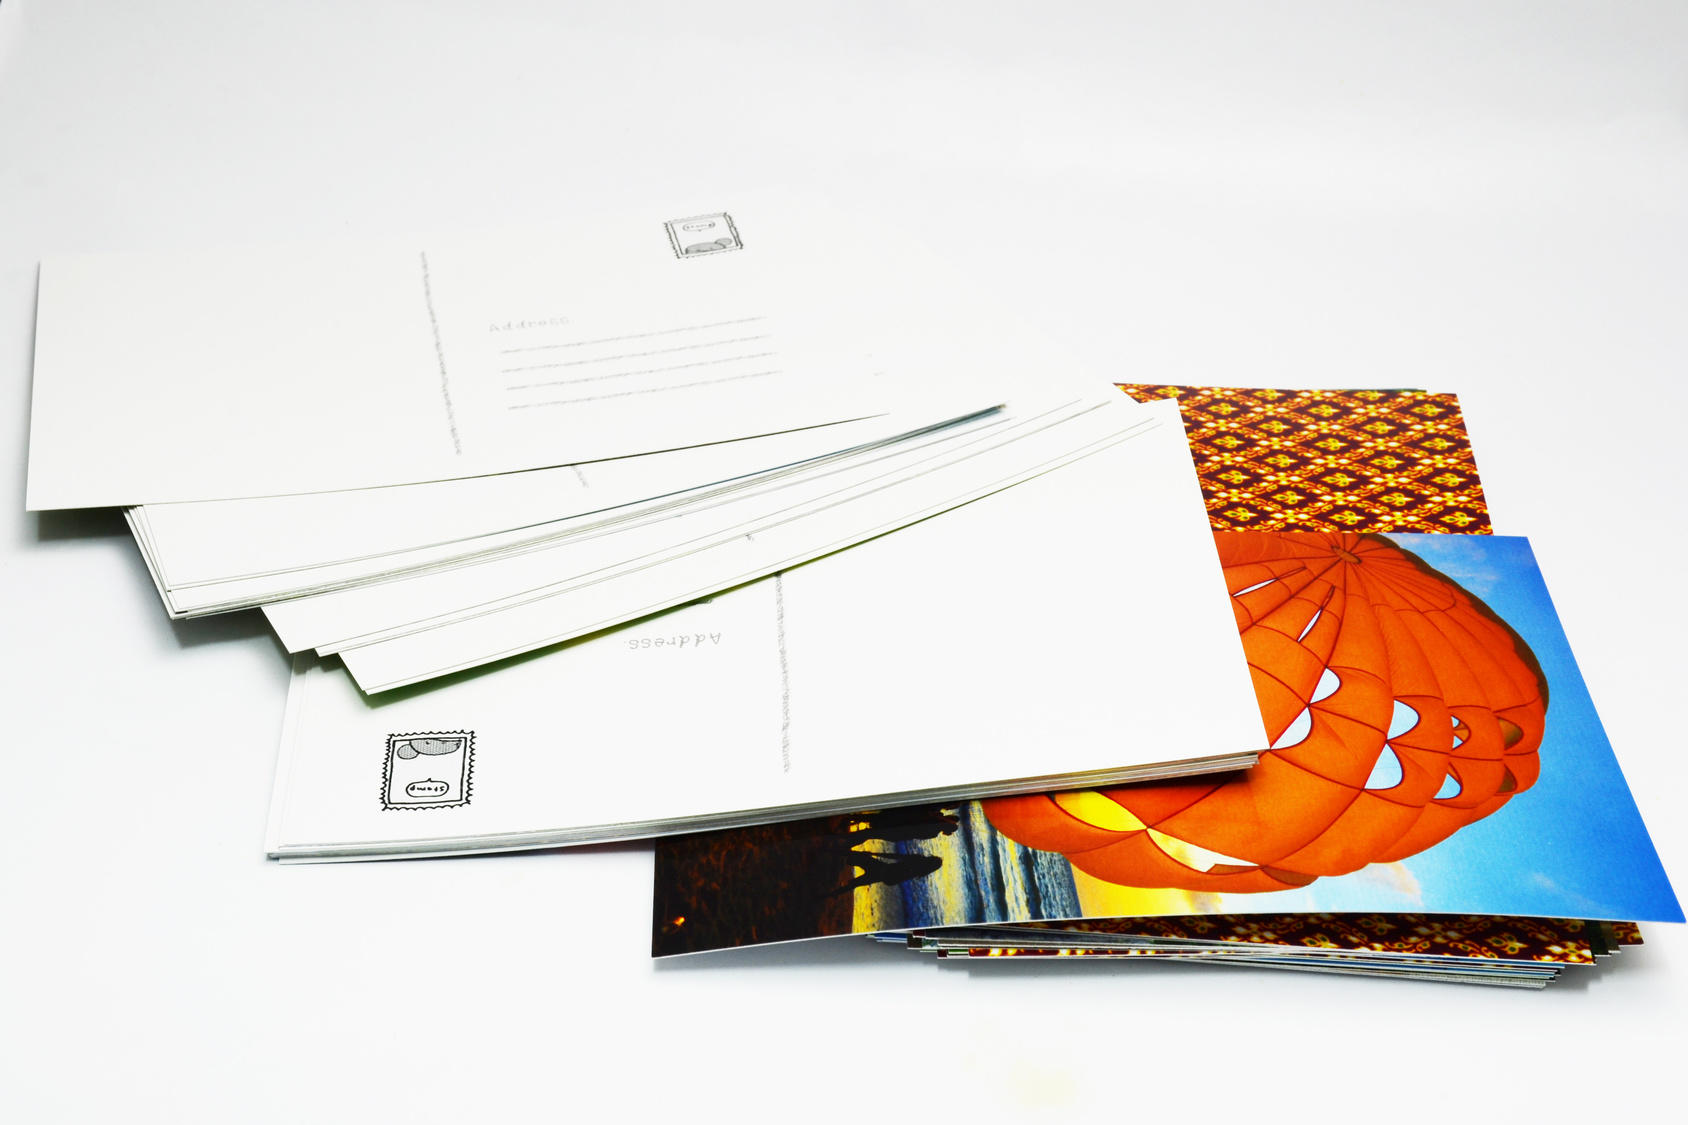 Gowans Printing Company image 9